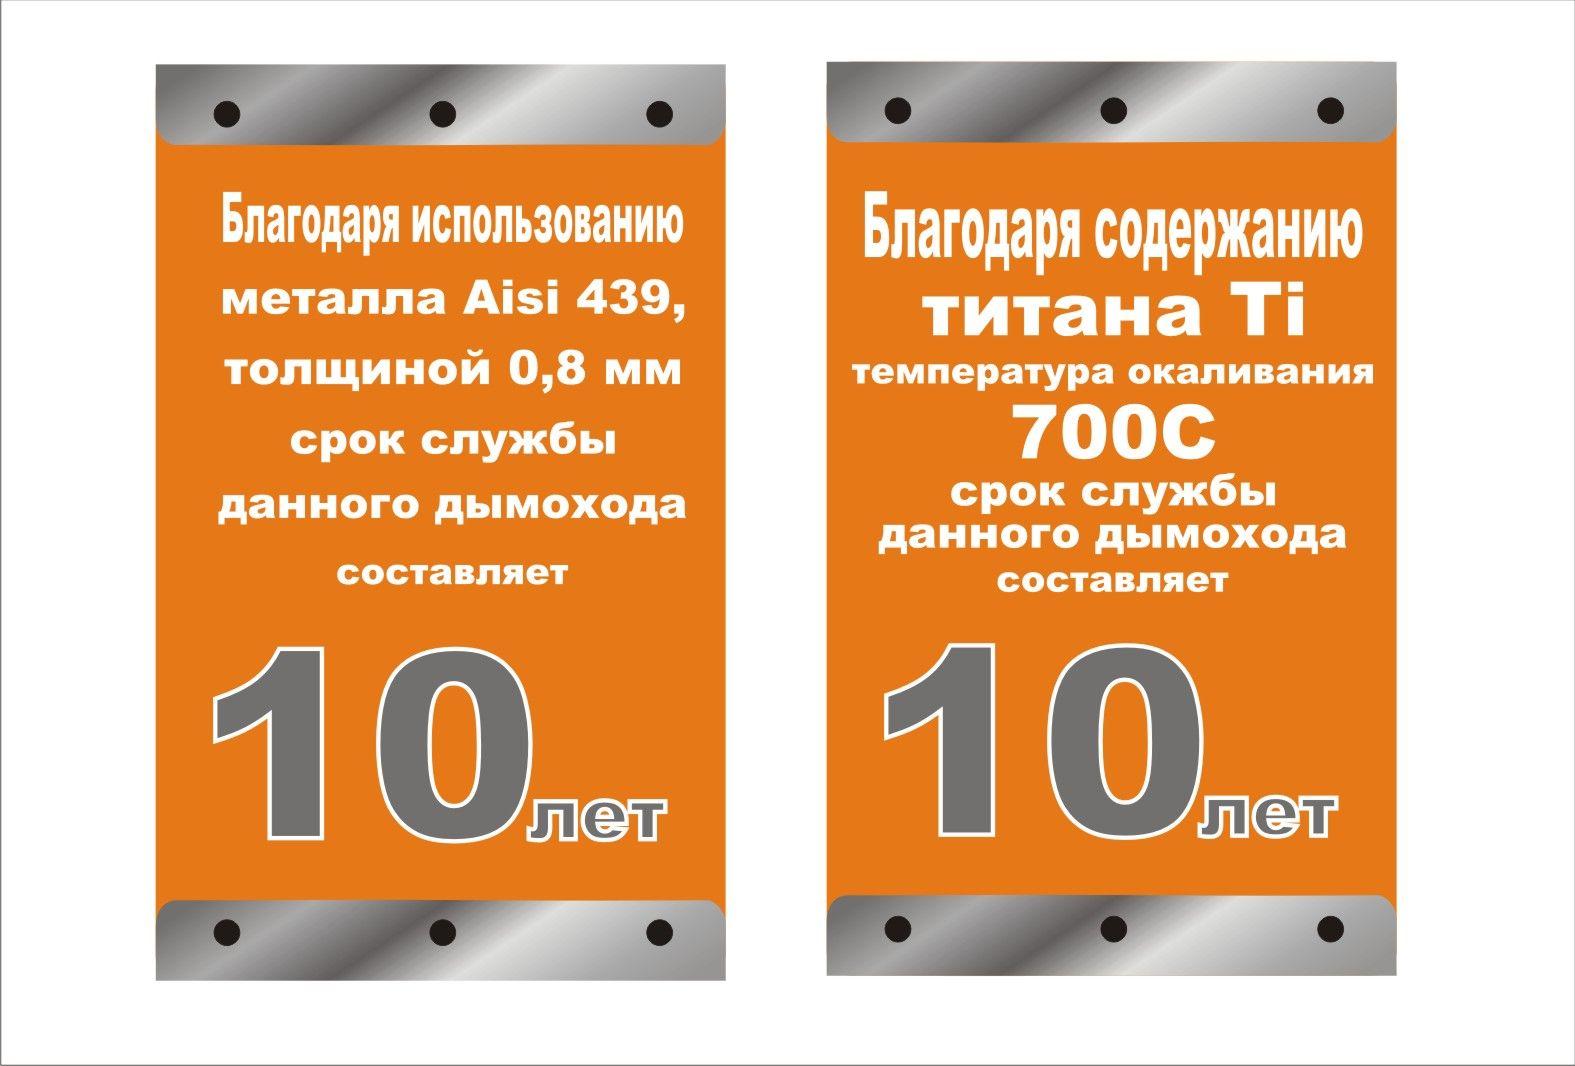 Наклейка на дымоход - дизайнер Evgenia_021